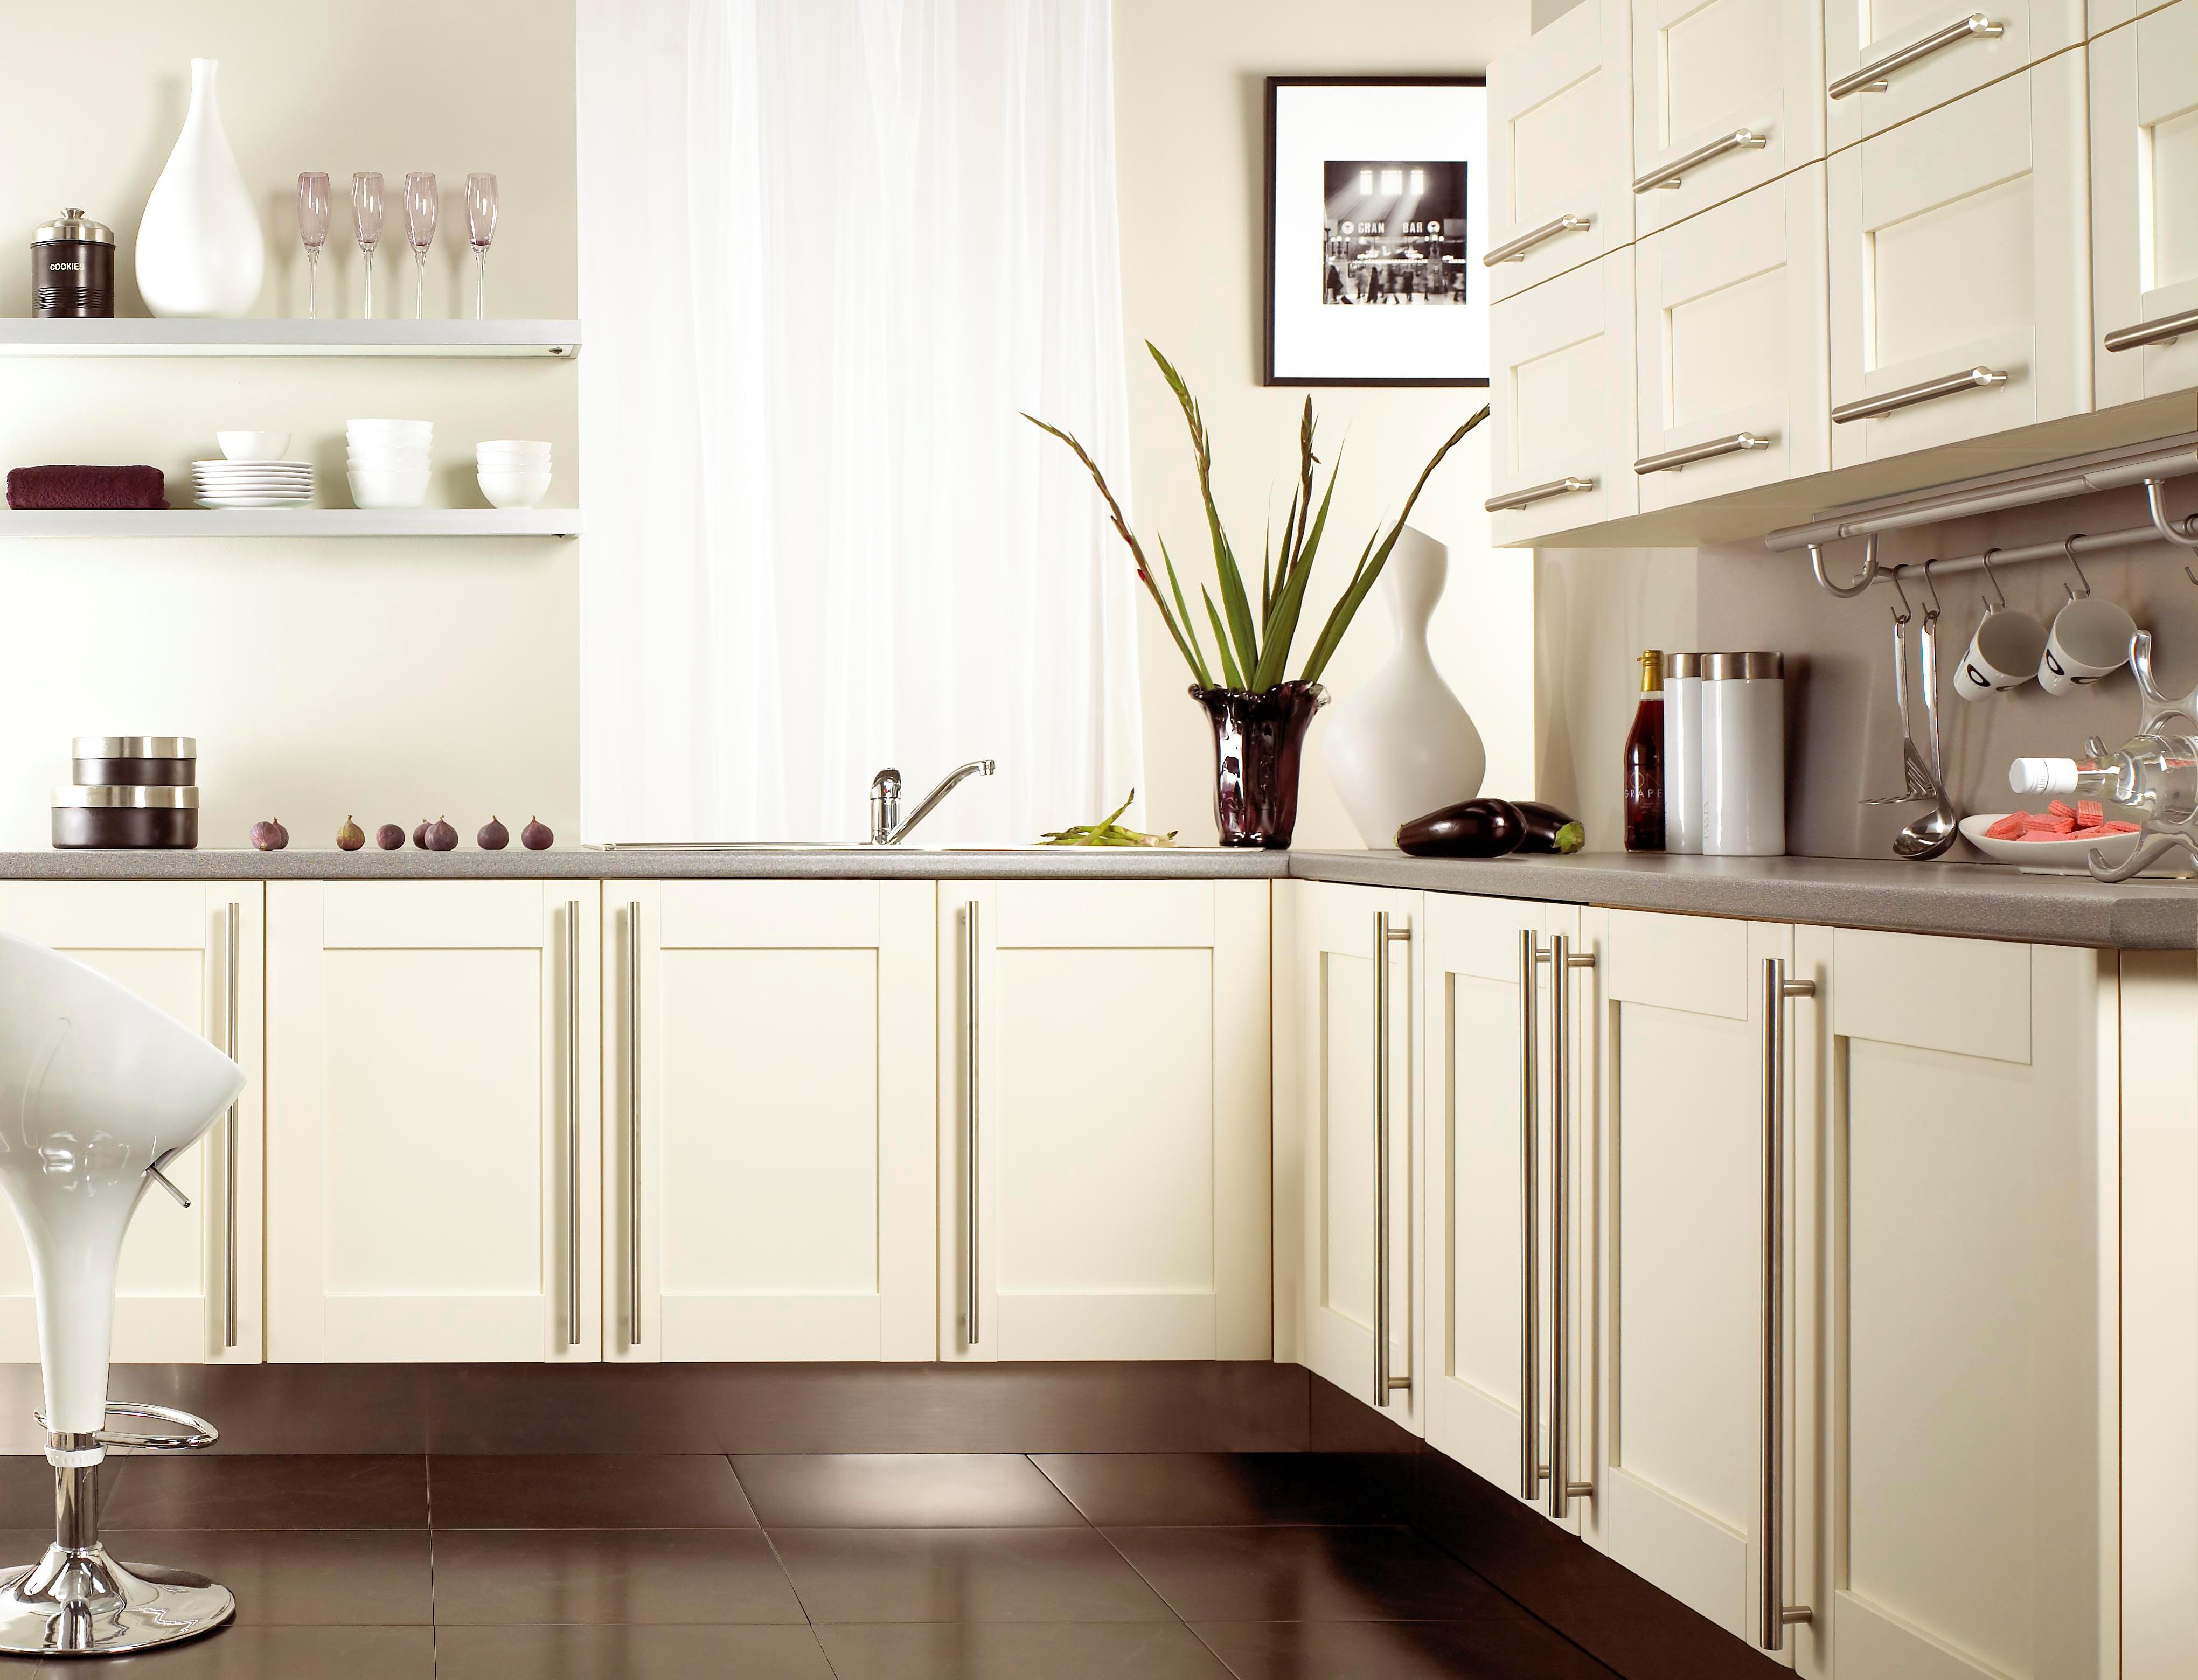 41+ Small Kitchen Design Ideas